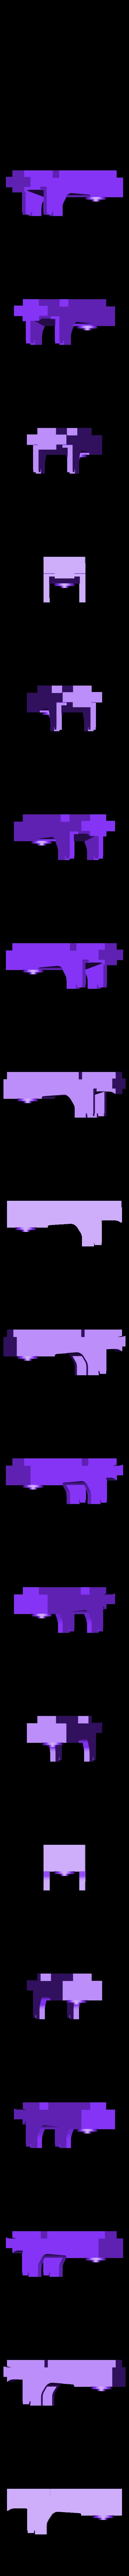 Front_Engine_-_Part_8.STL Download free STL file 4-8-8-4 Big Boy Locomotive • 3D printer object, RaymondDeLuca